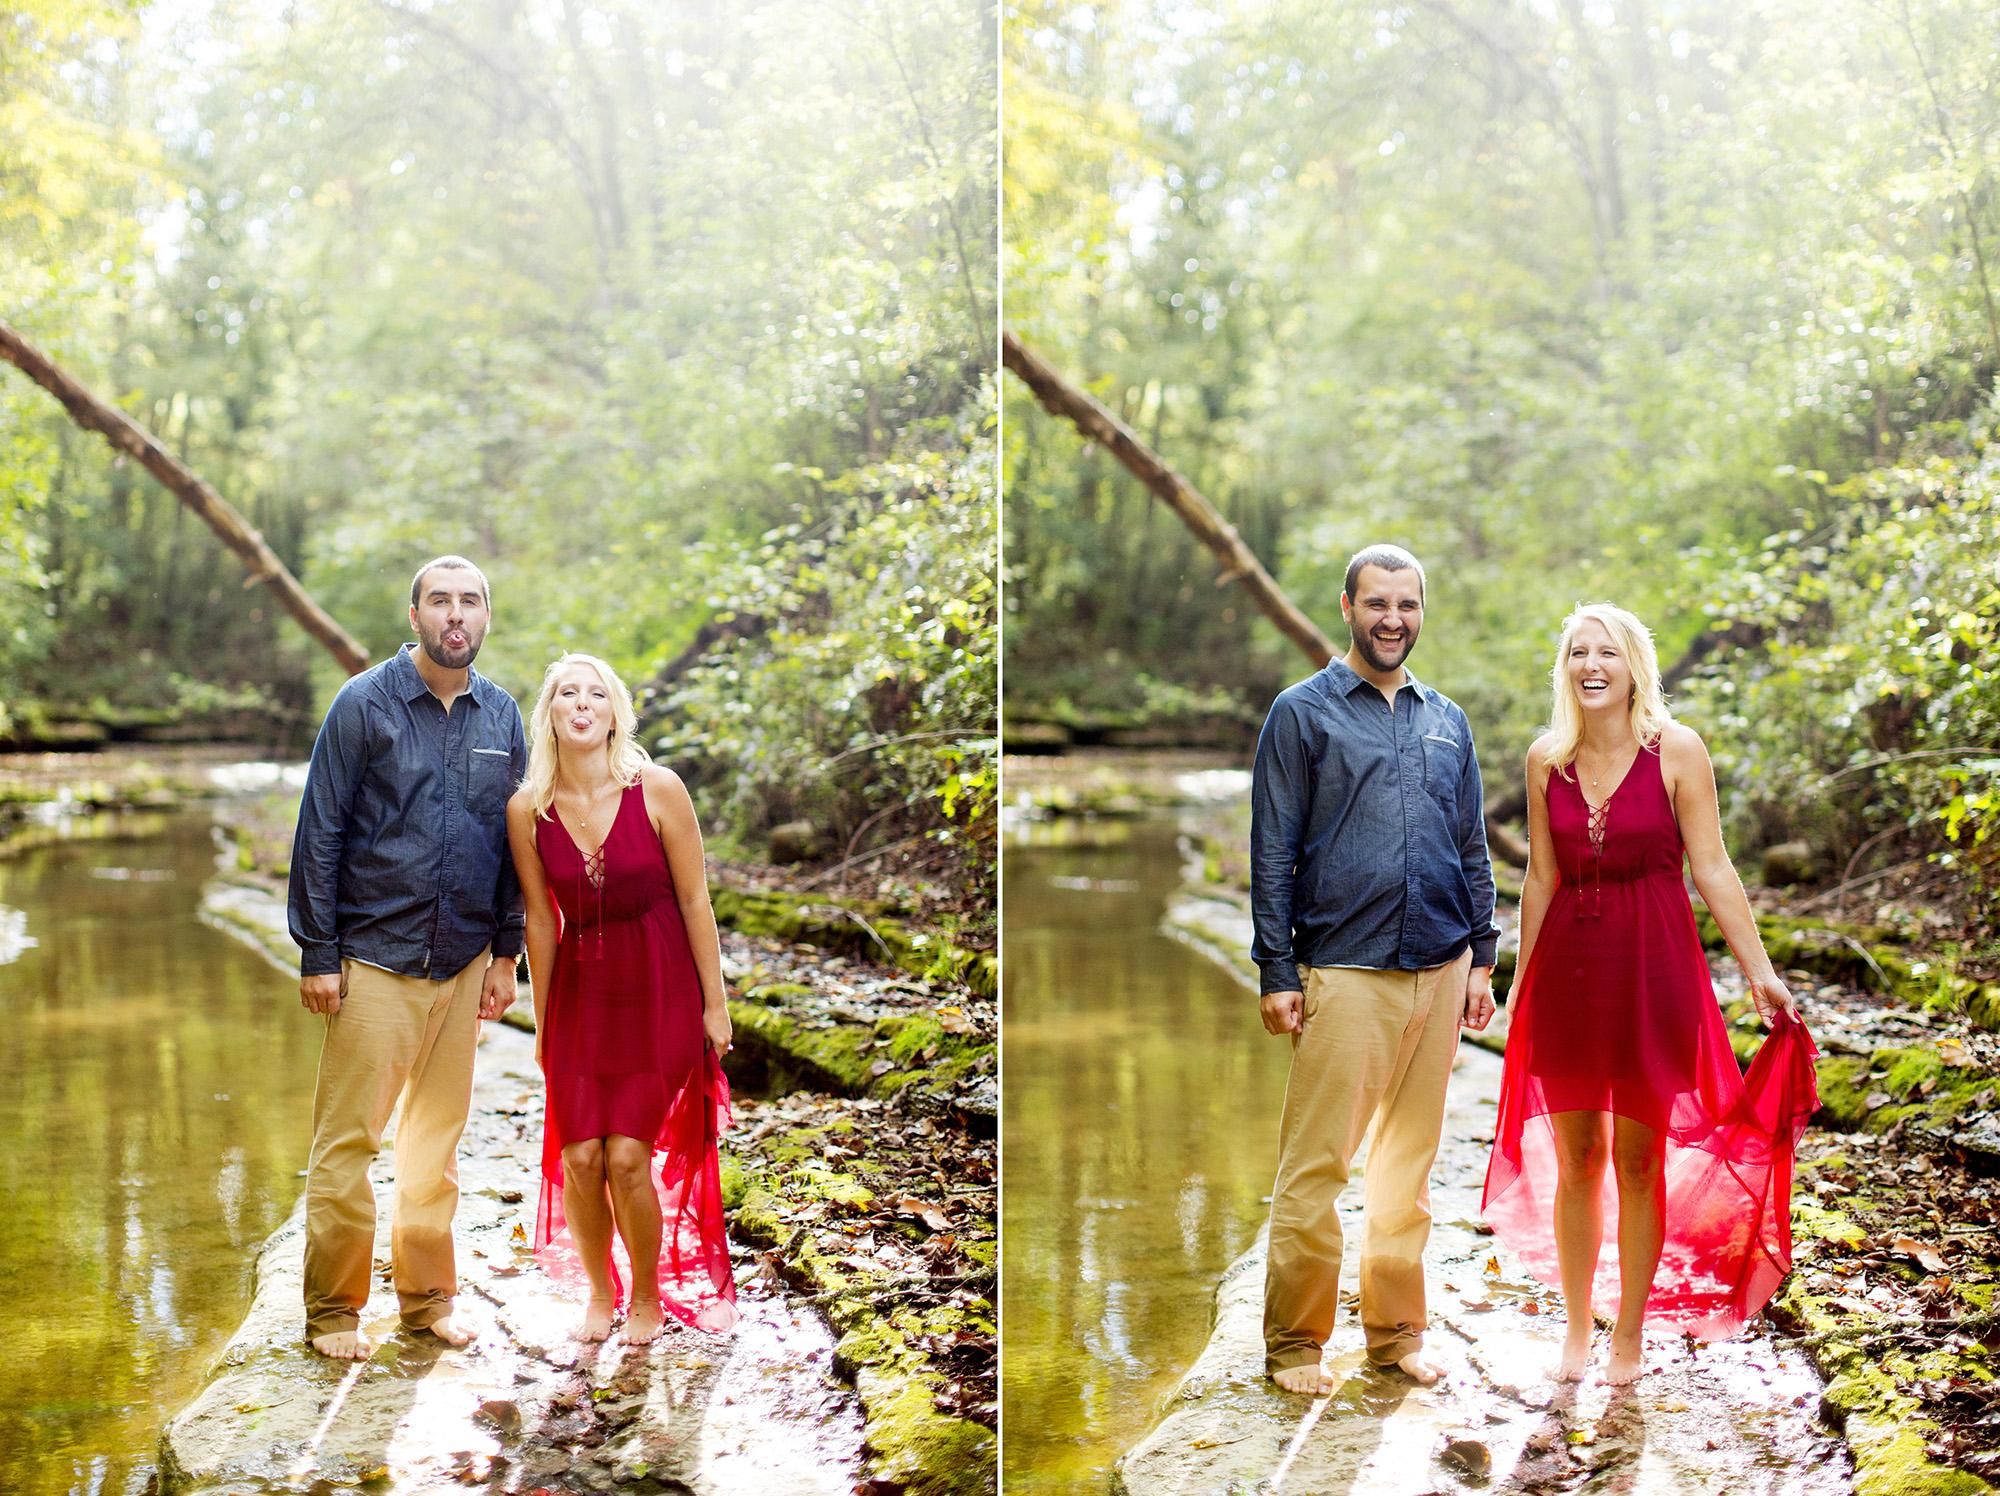 Seriously_Sabrina_Photography_Lexington_Kentucky_Creek_Engagement_AB107.jpg